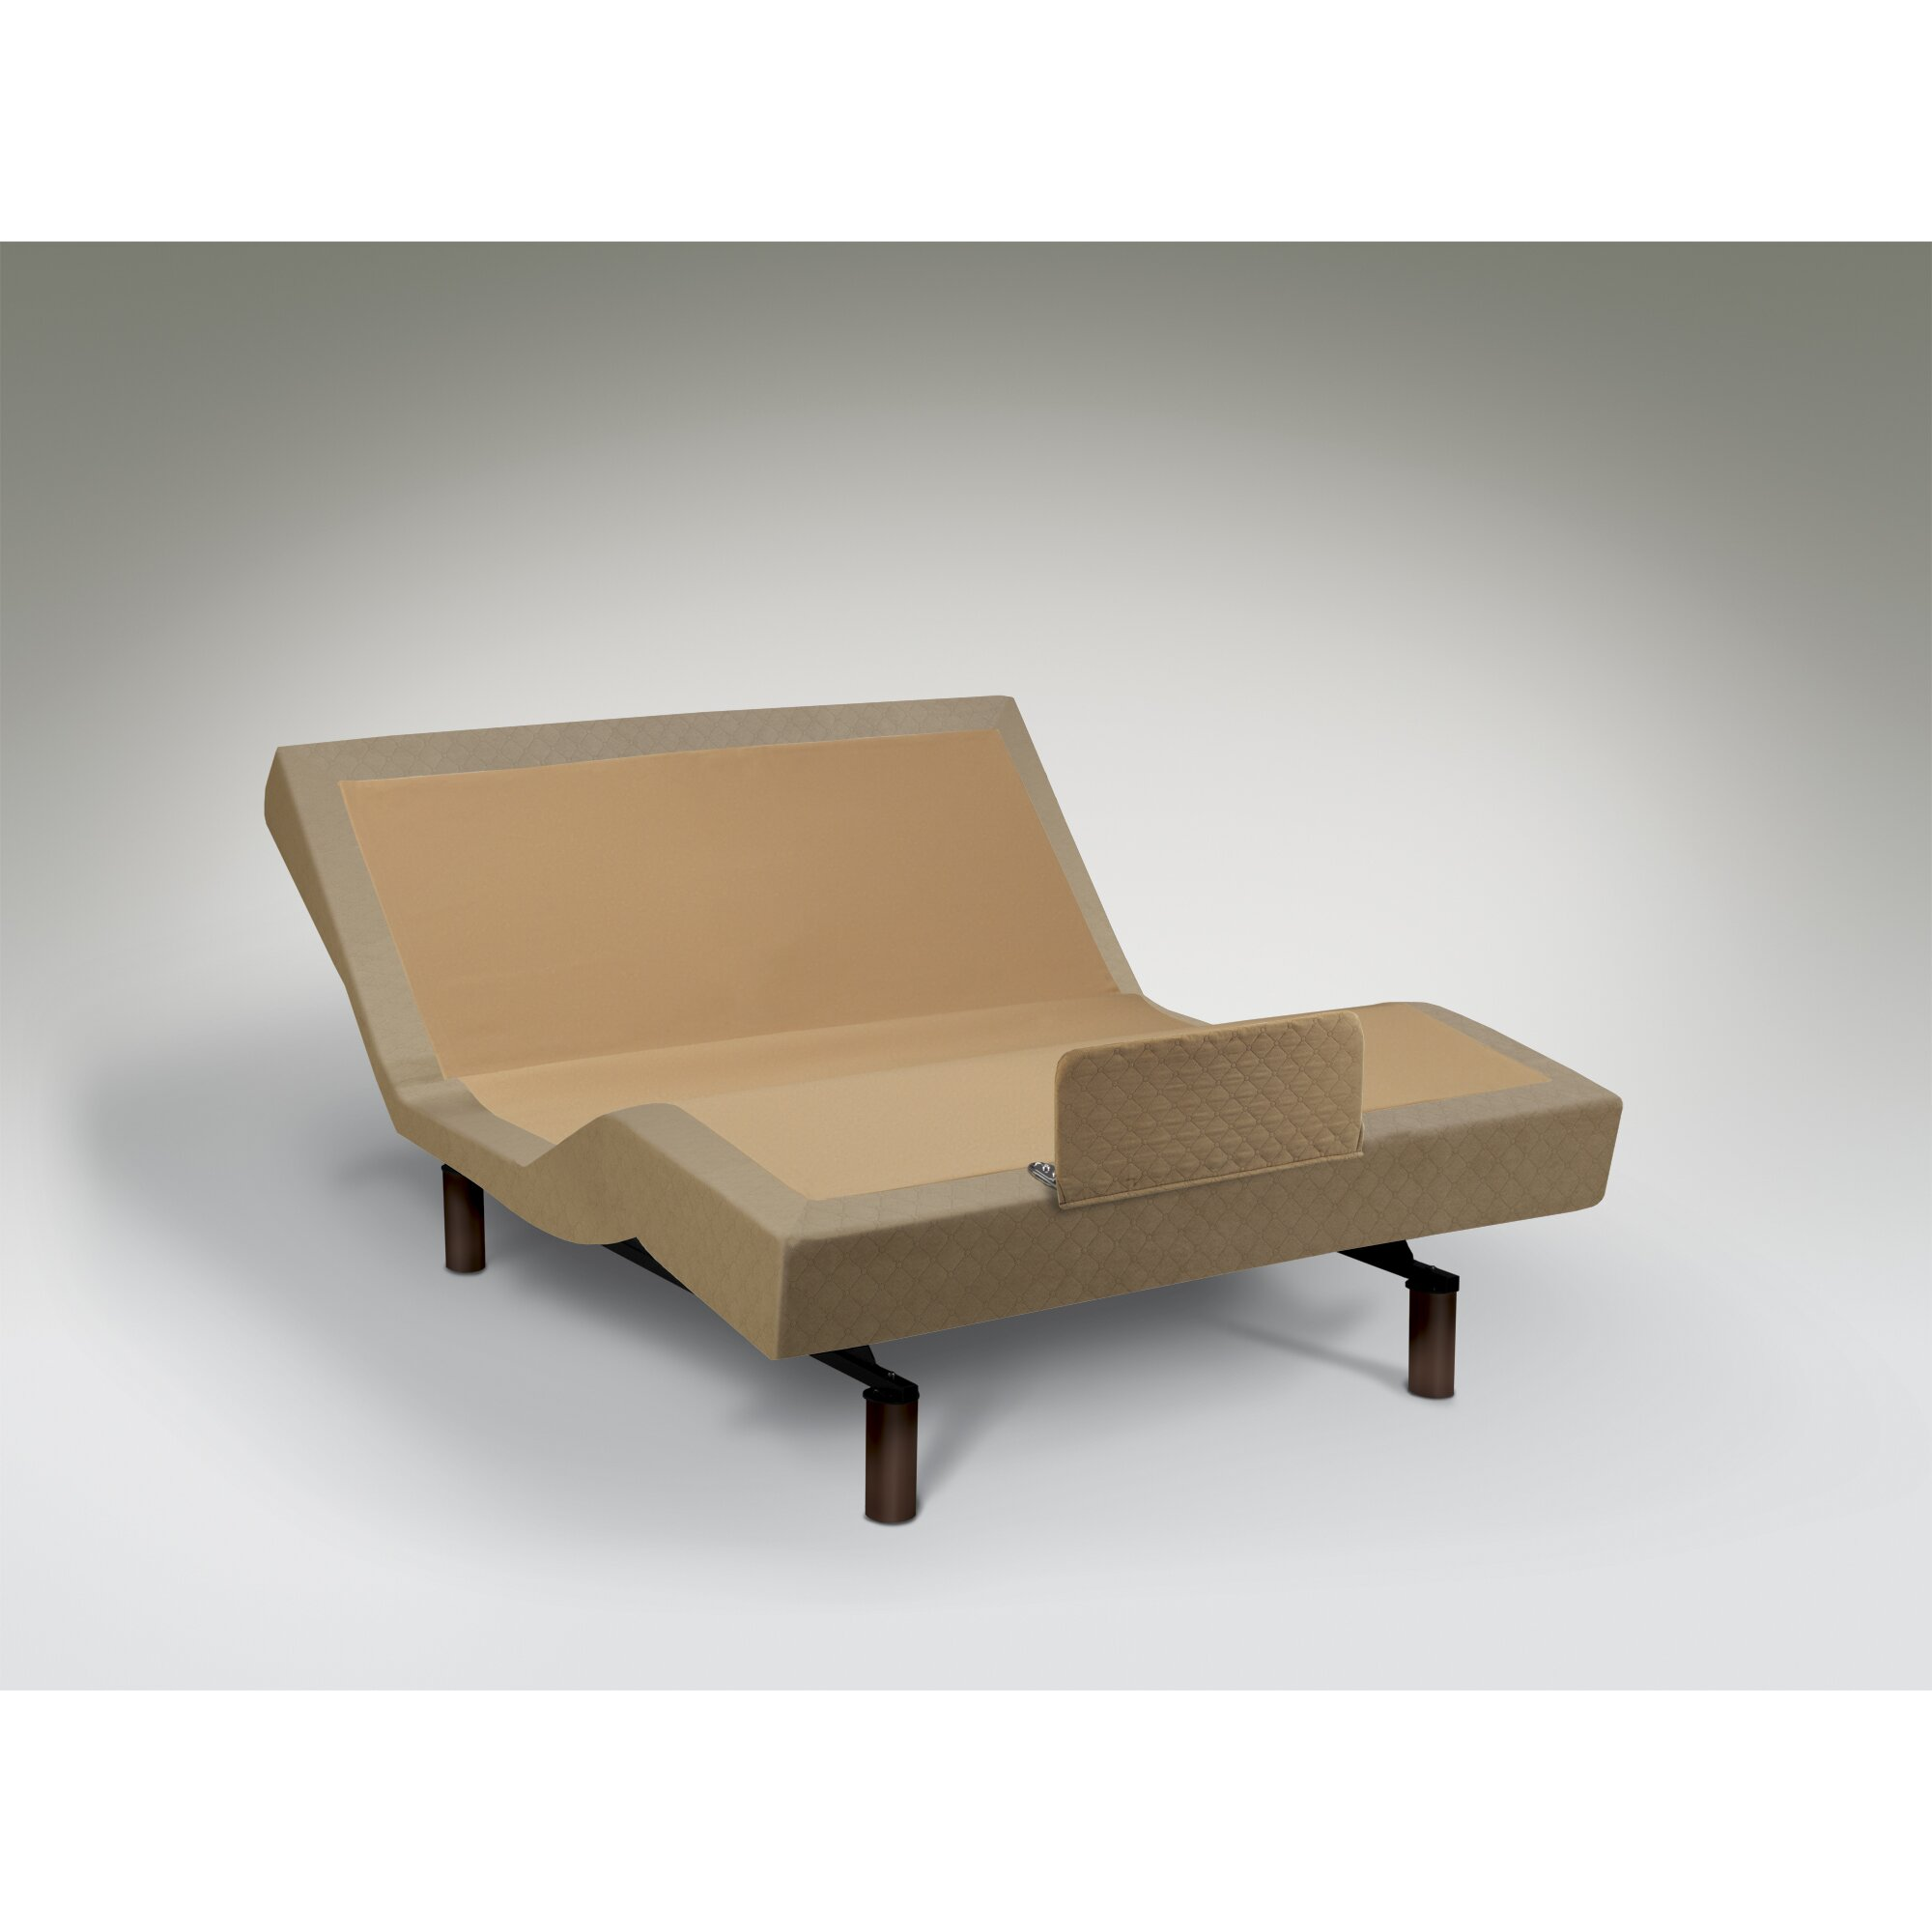 tempur pedic dog bed by tempur pedic tempur ergo grand adjustable base amp reviews